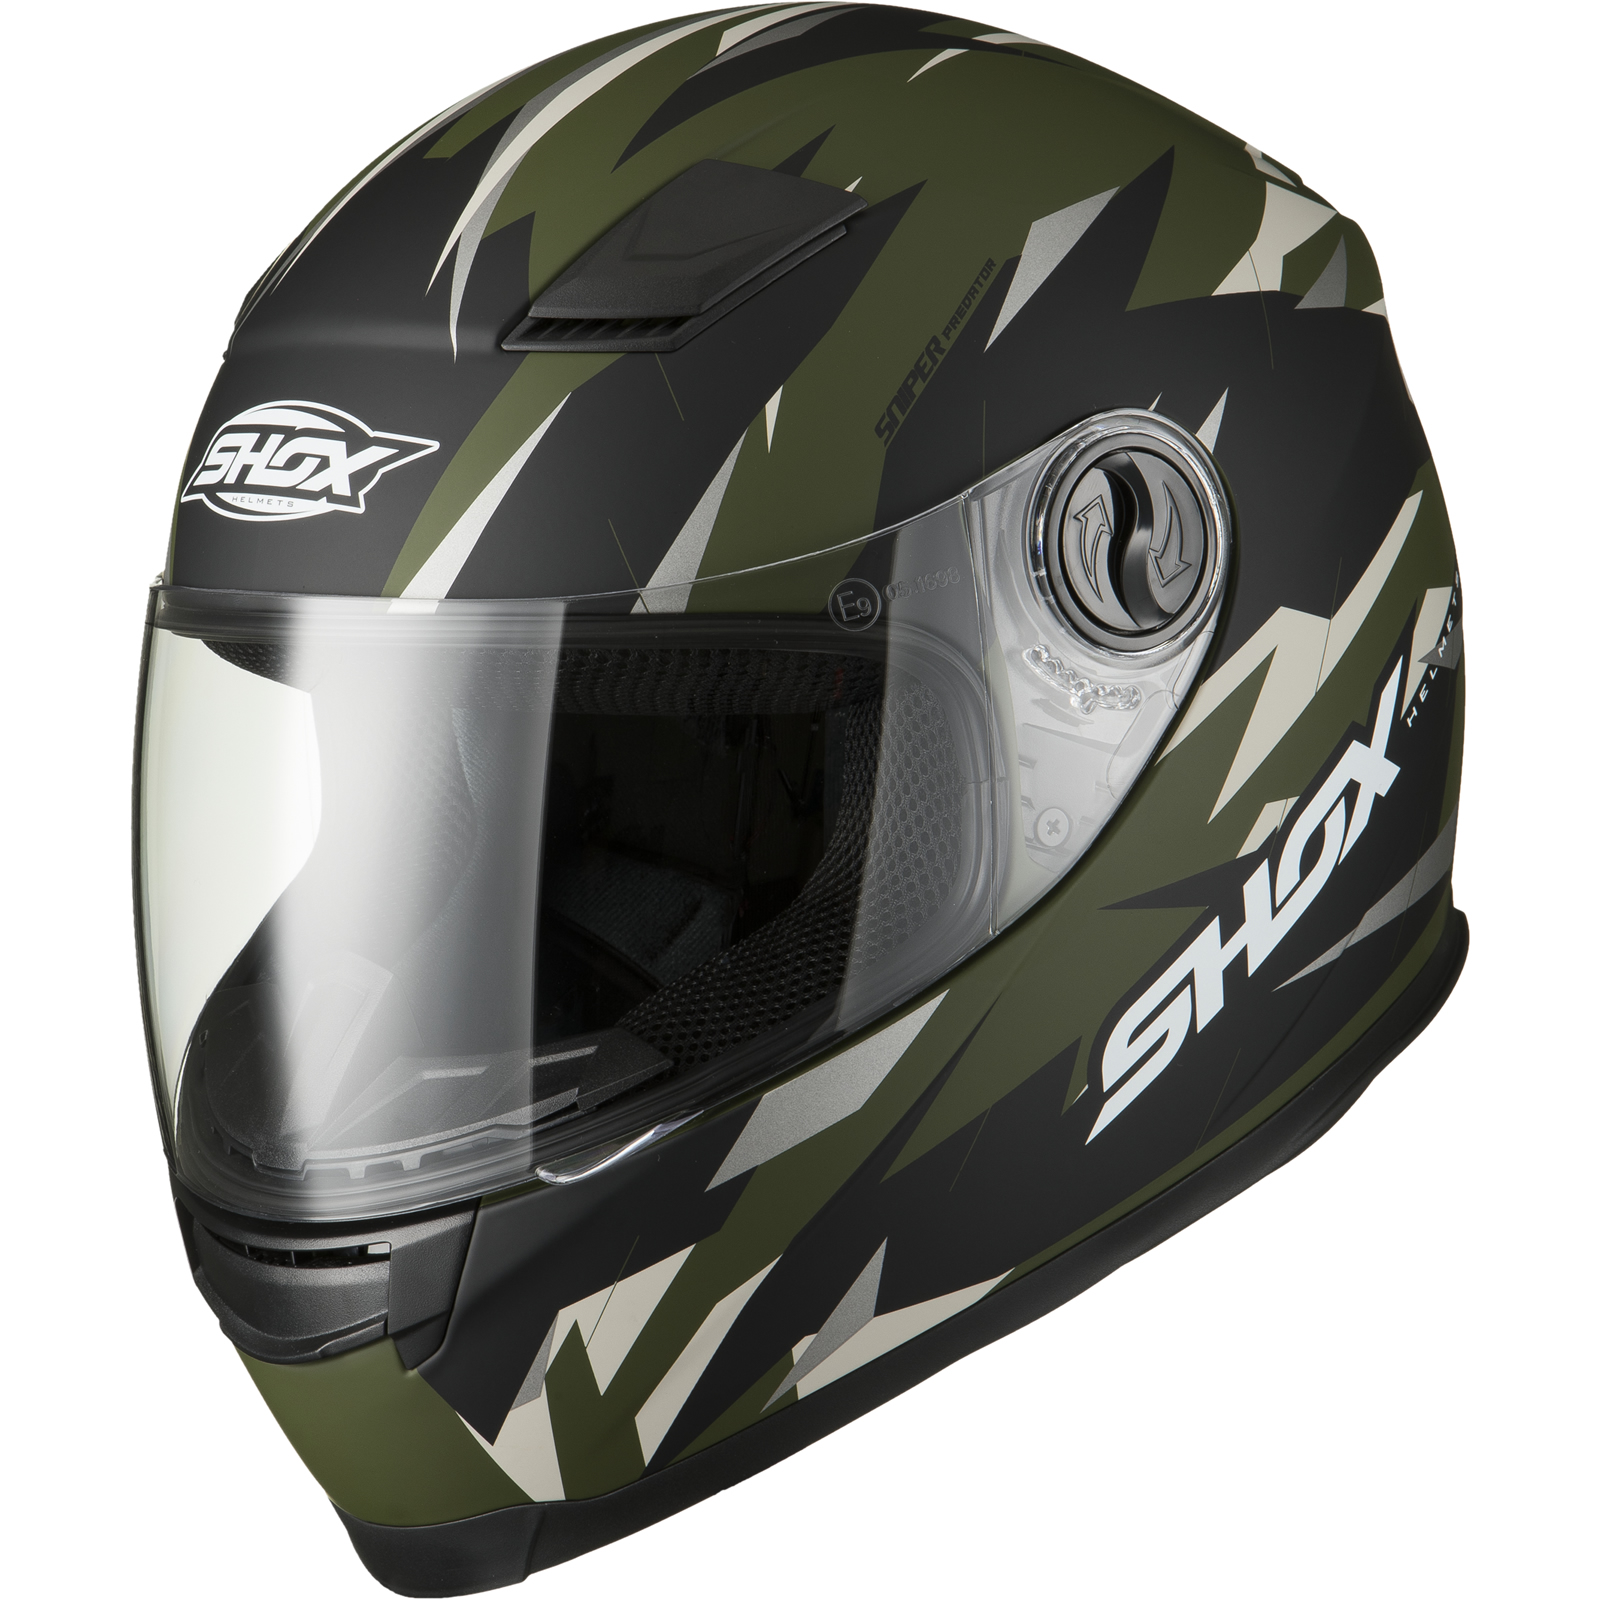 Shox Sniper Predator Full Face Motorbike Motorcycle Army